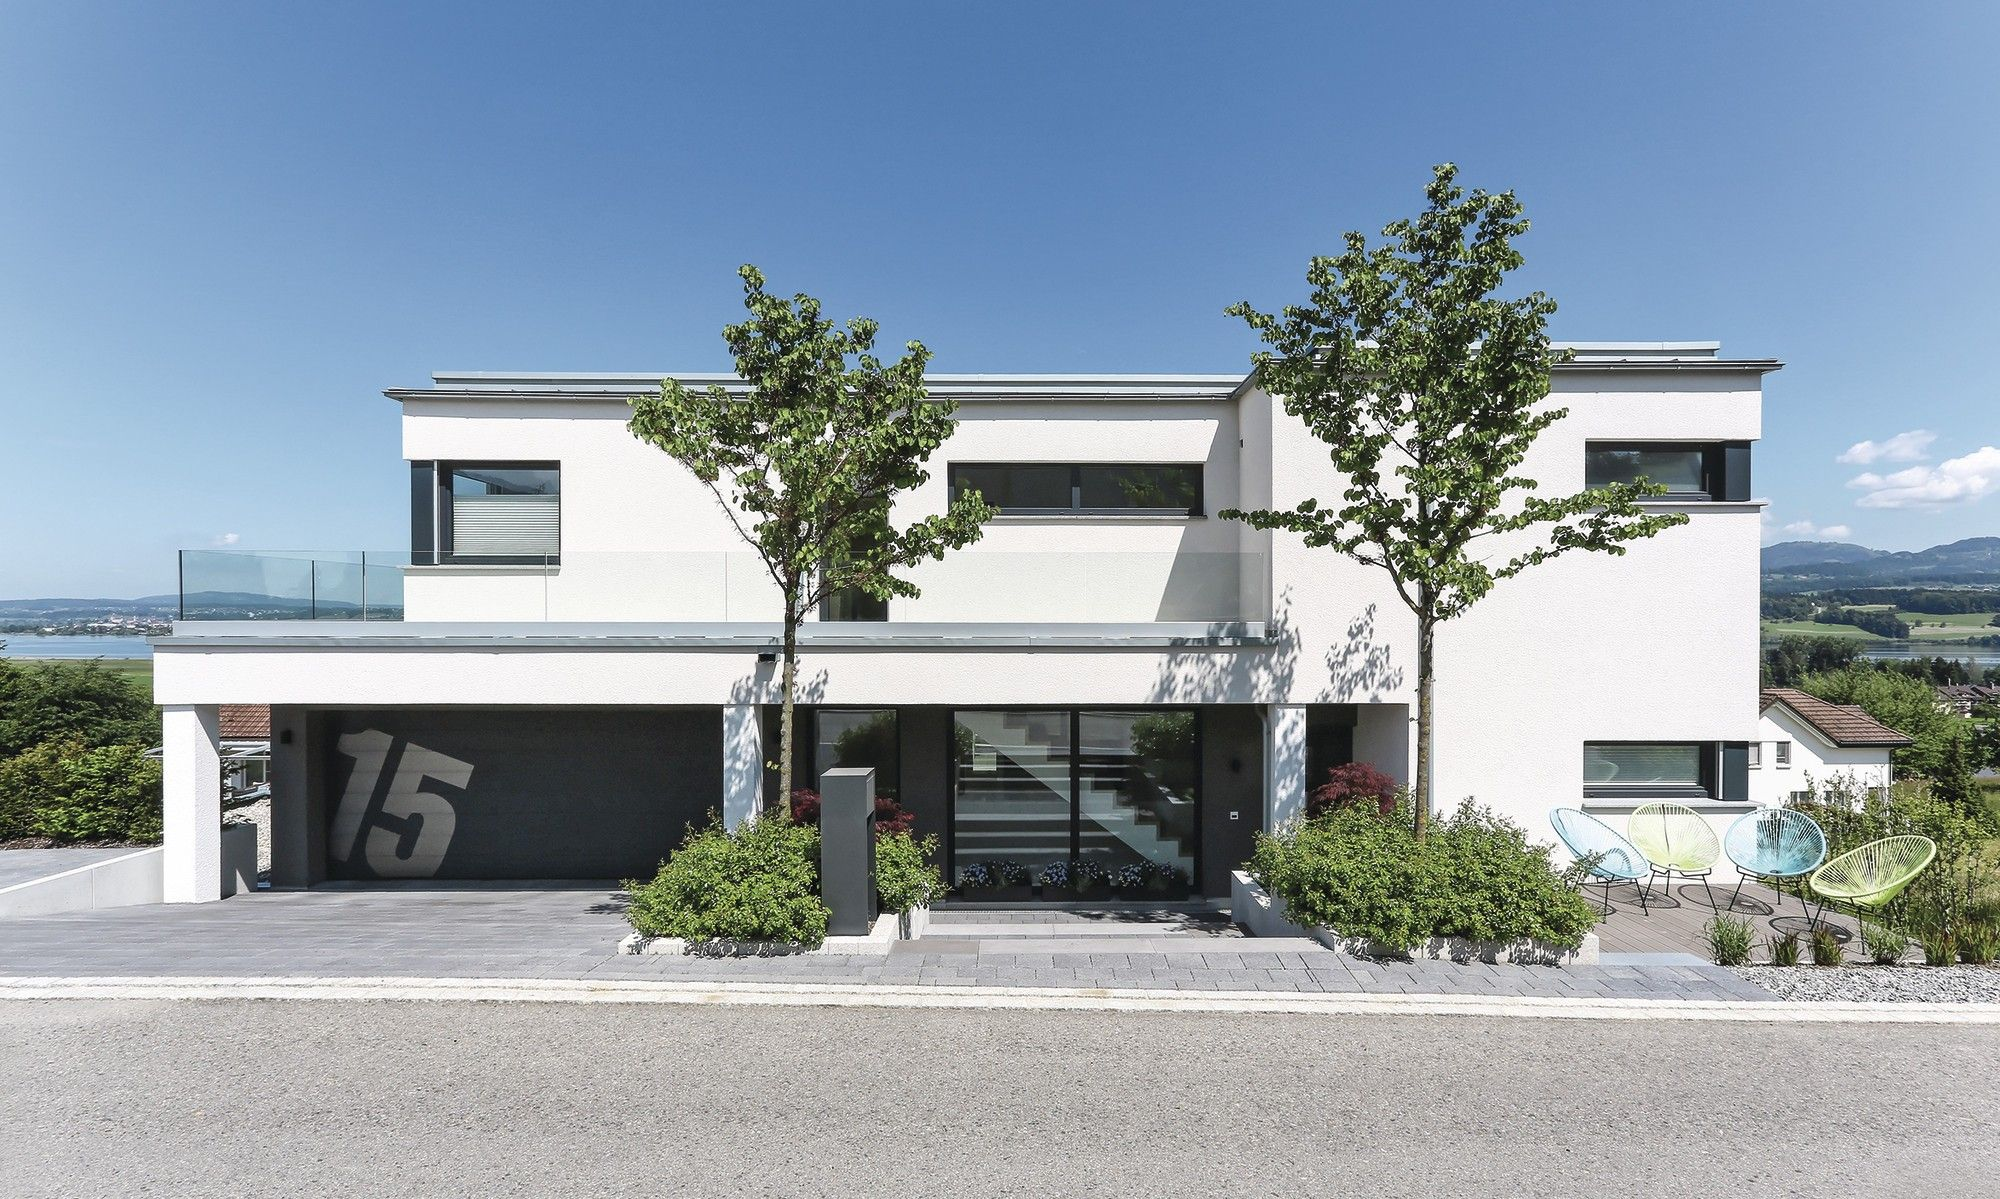 fertighaus weberhaus holzbauweise villa pool lakelucerne schweiz haus h user. Black Bedroom Furniture Sets. Home Design Ideas